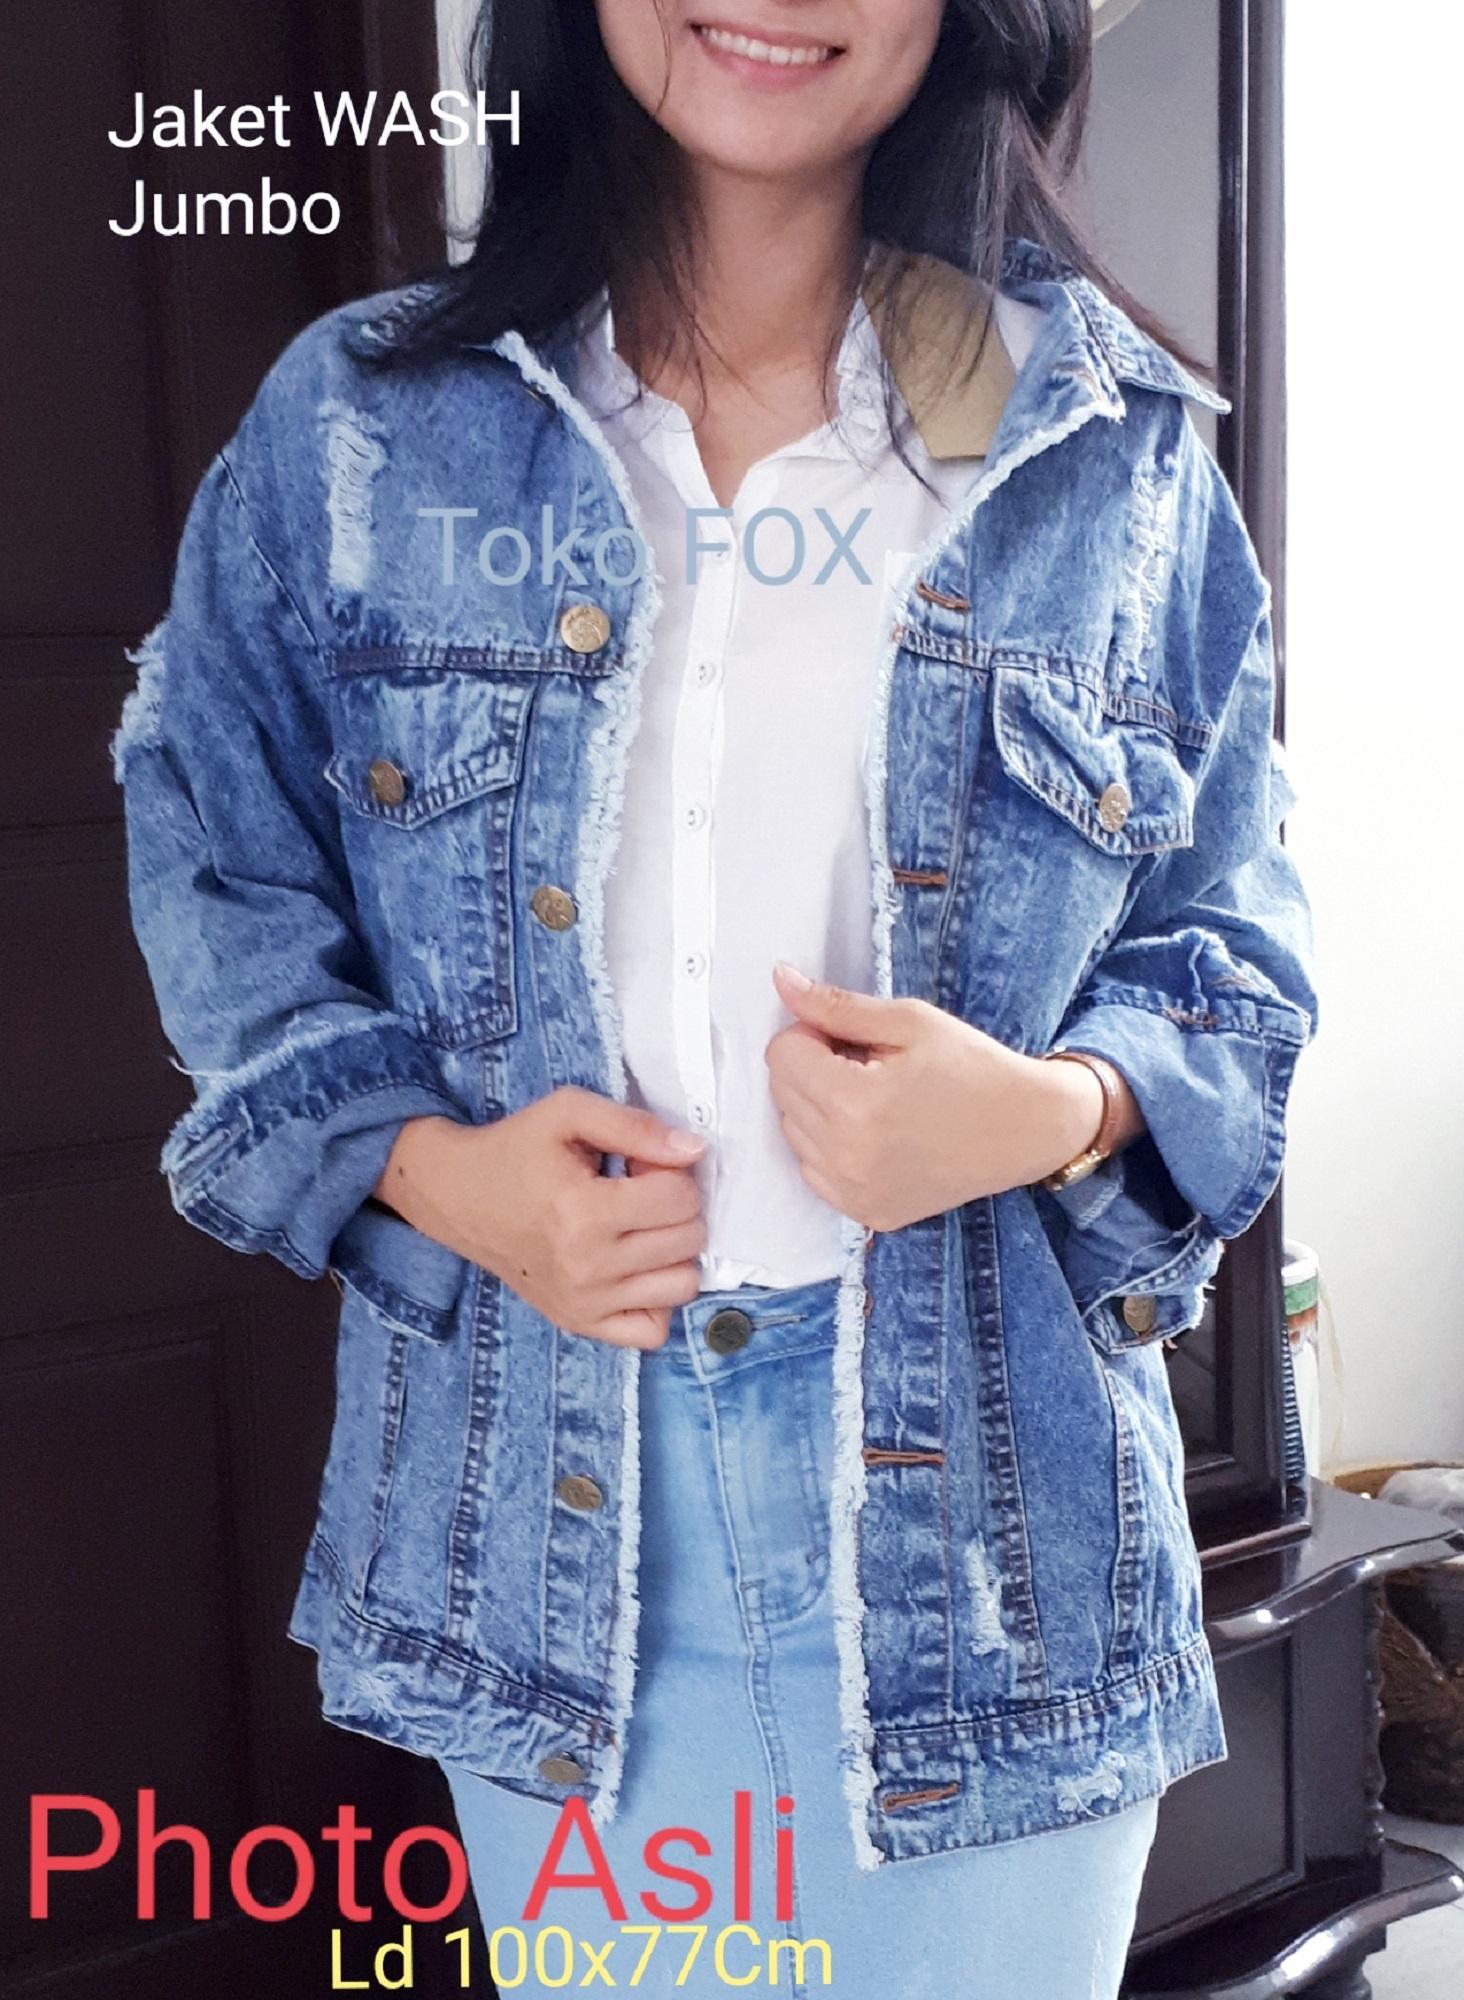 Buy Sell Cheapest Jaket Jeans Sobek Best Quality Product Deals Pria Biru Muda Wash Wanita Photo Asli Jacket